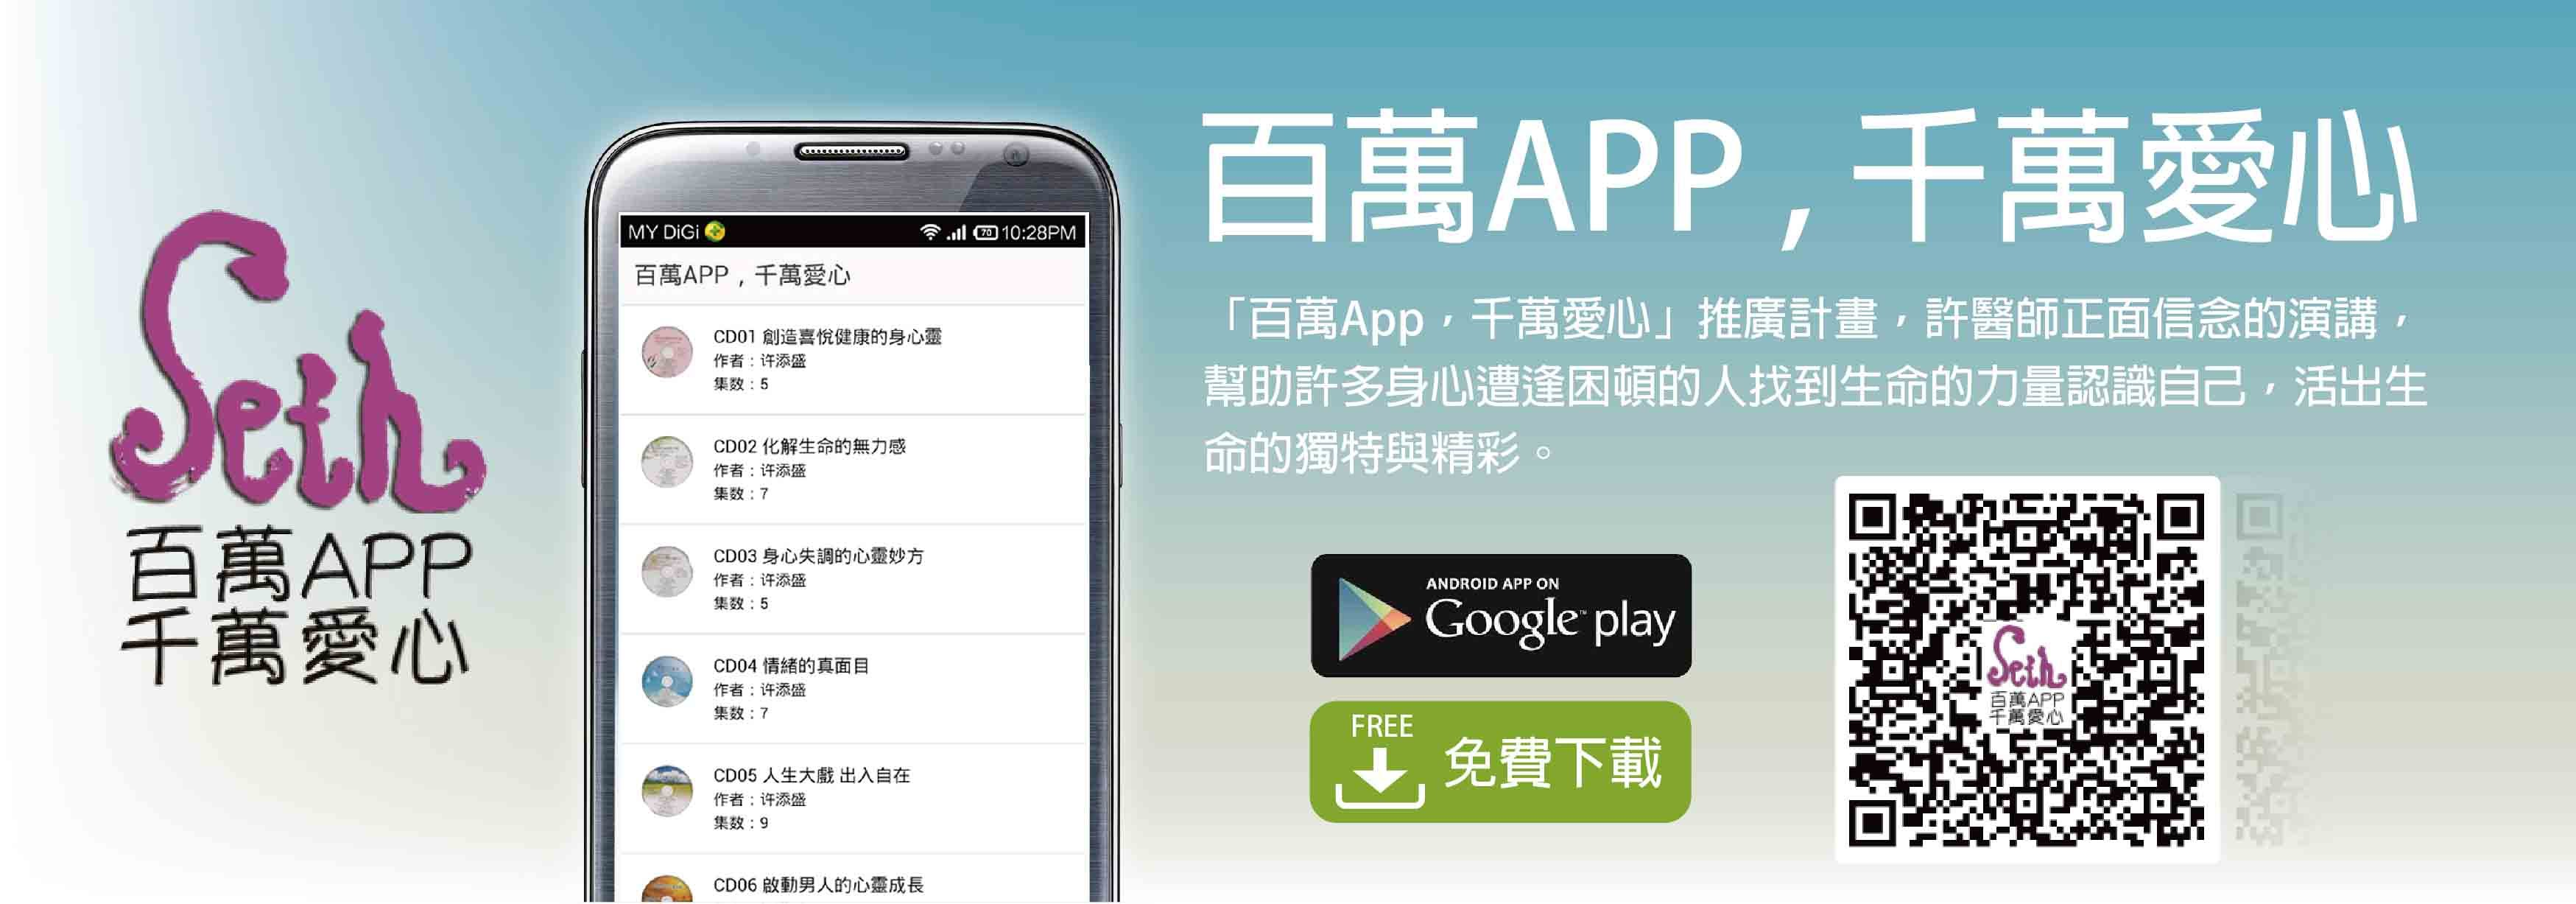 https://play.google.com/store/apps/details?id=com.ionicframework.sethapp659994&hl=zh_TW